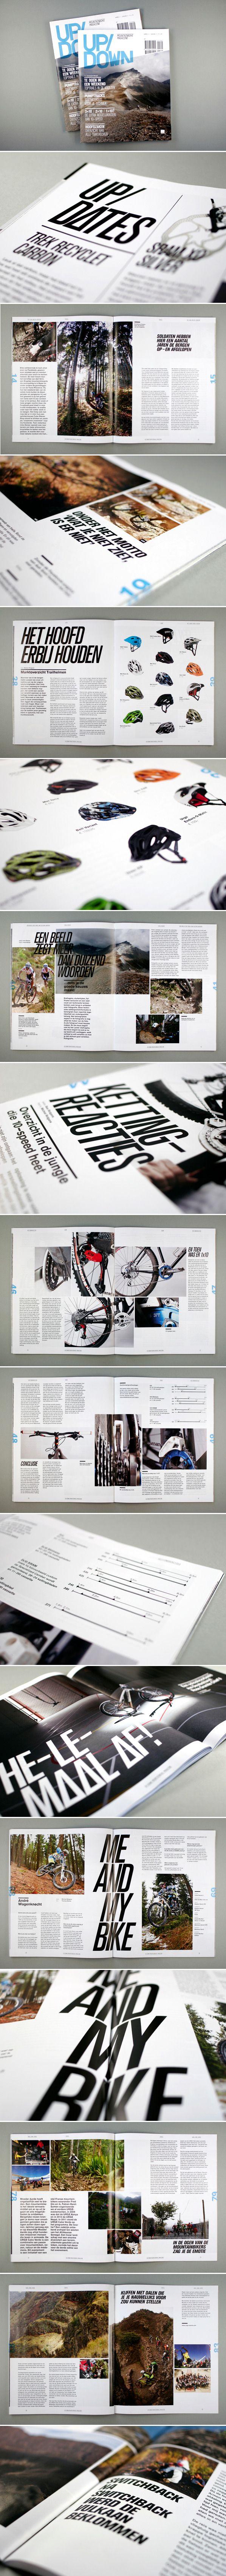 Up/Down Mountainbike Magazine by OK200 , via Behance